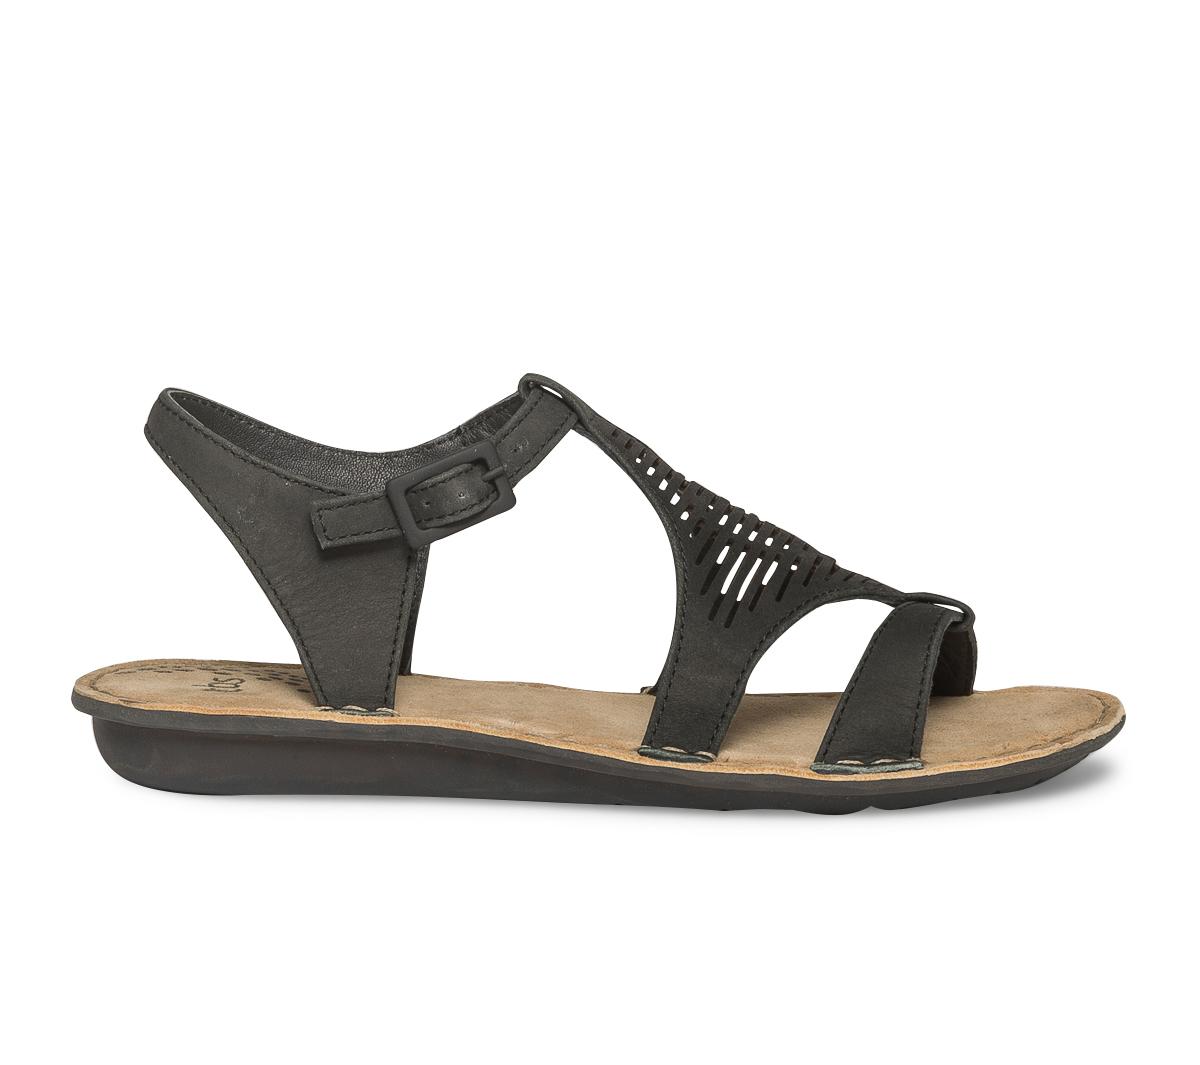 Cuir Sandale Tbs Tbs Sandale Noir PkZuOXi